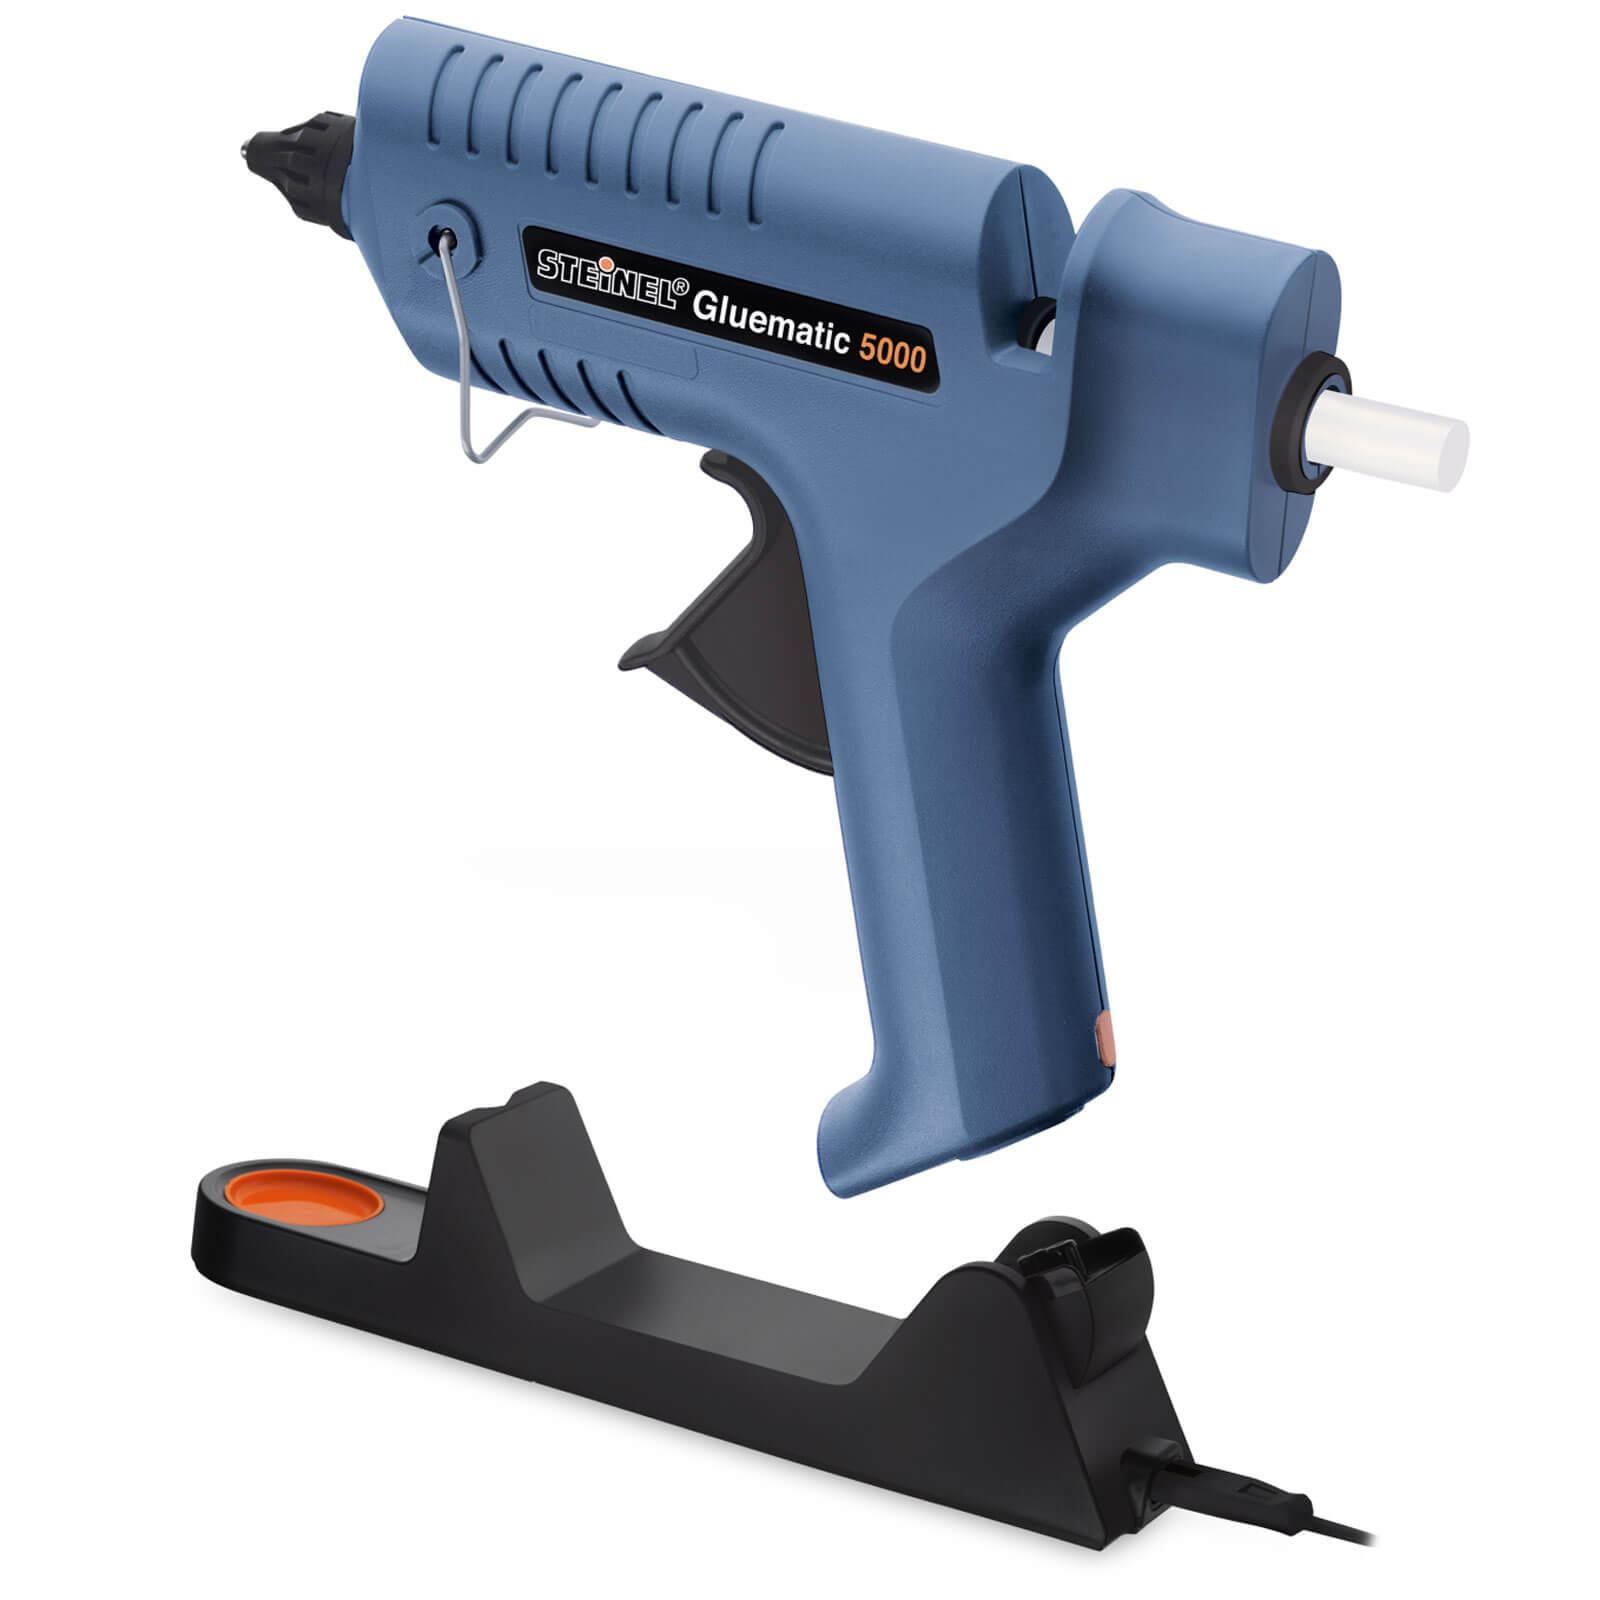 Steinel GLUEMATIC 5000 DIY Hot Melt Glue Gun 240v